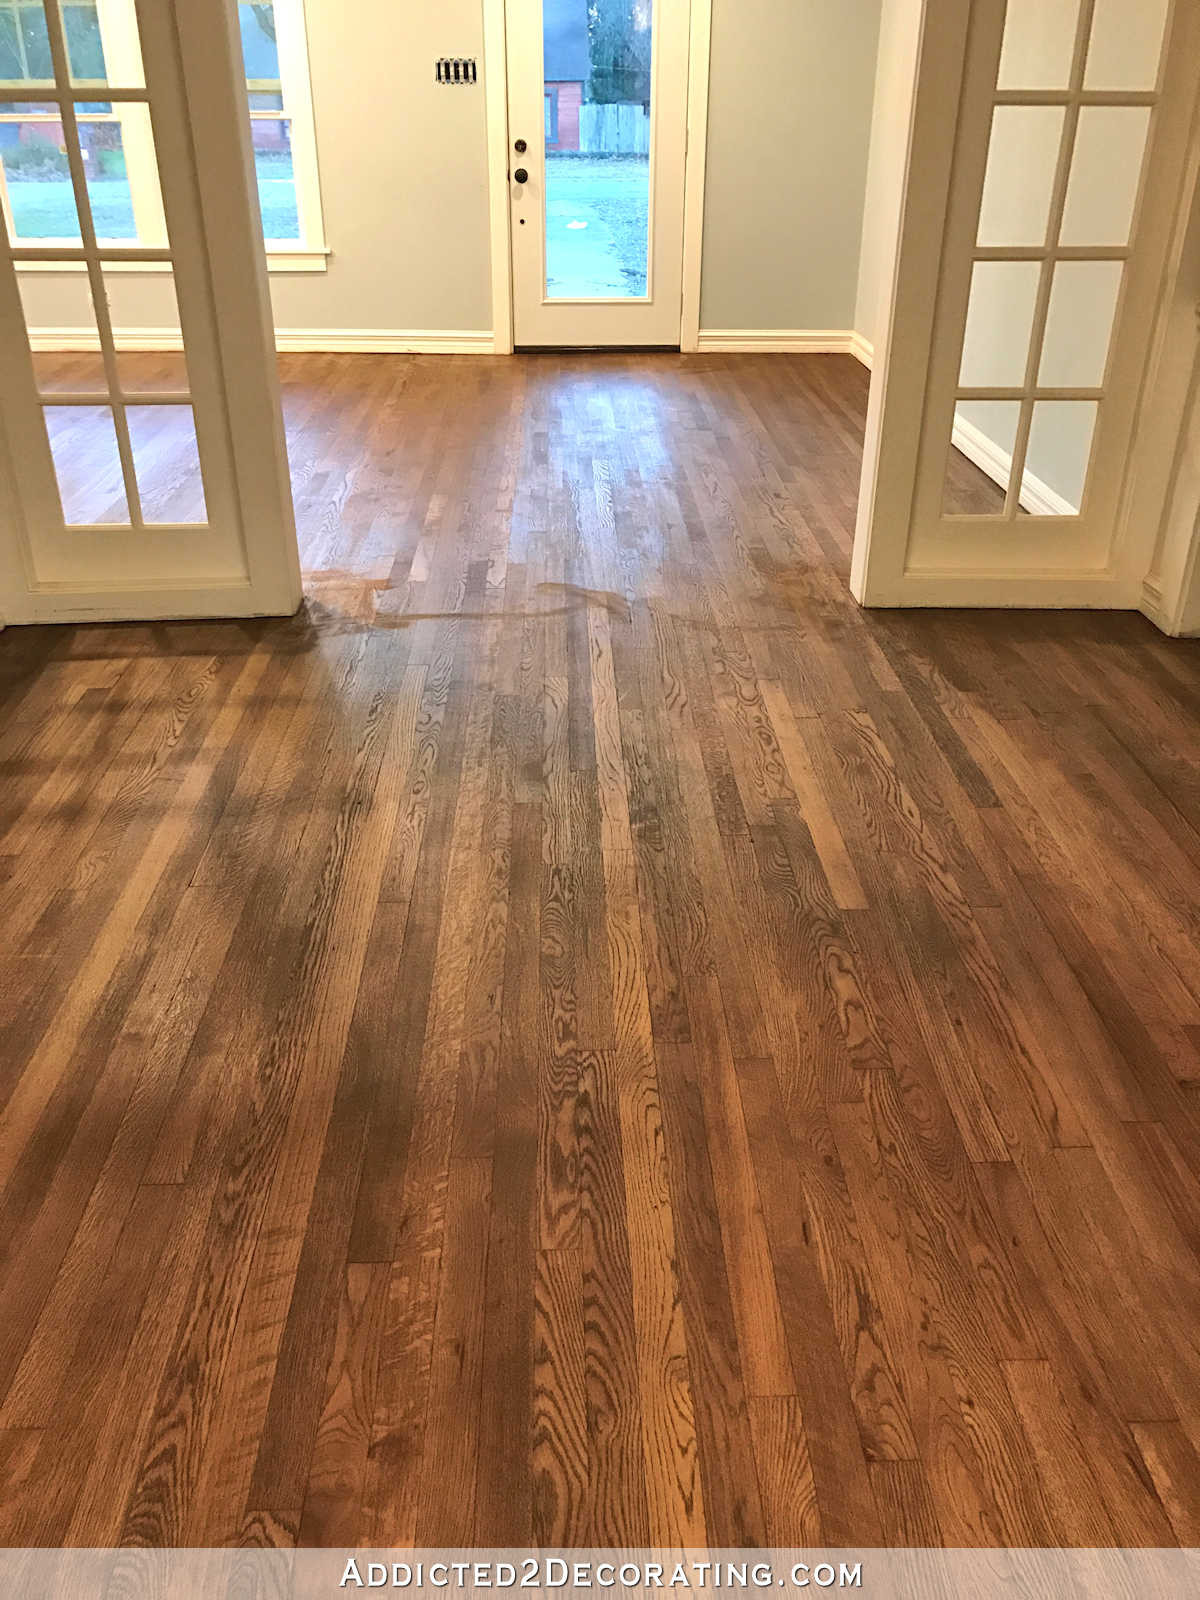 polyurethane finish hardwood floors of adventures in staining my red oak hardwood floors products process pertaining to staining red oak hardwood floors 9 stain on entryway and music room floors